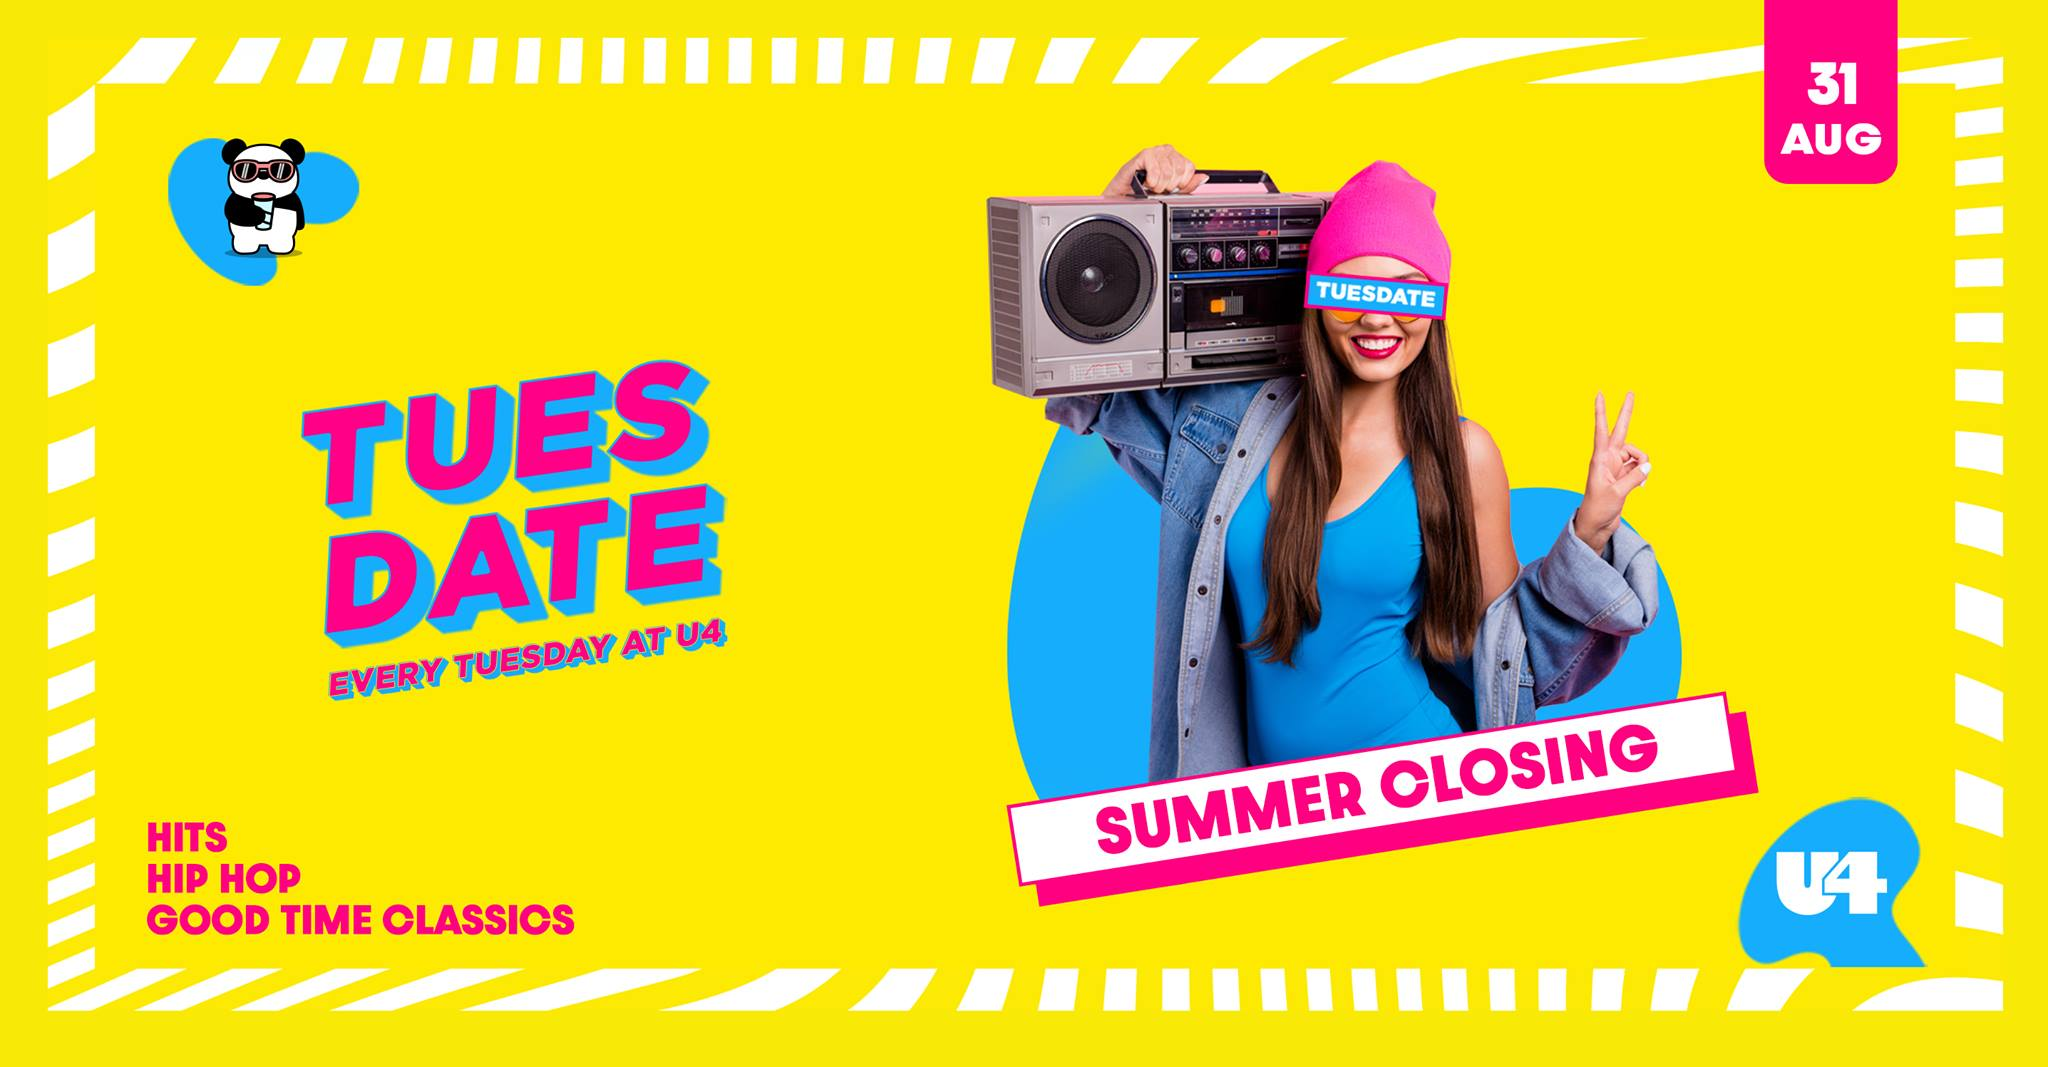 Events Wien: Summer Closing   Tuesdate   31.08.